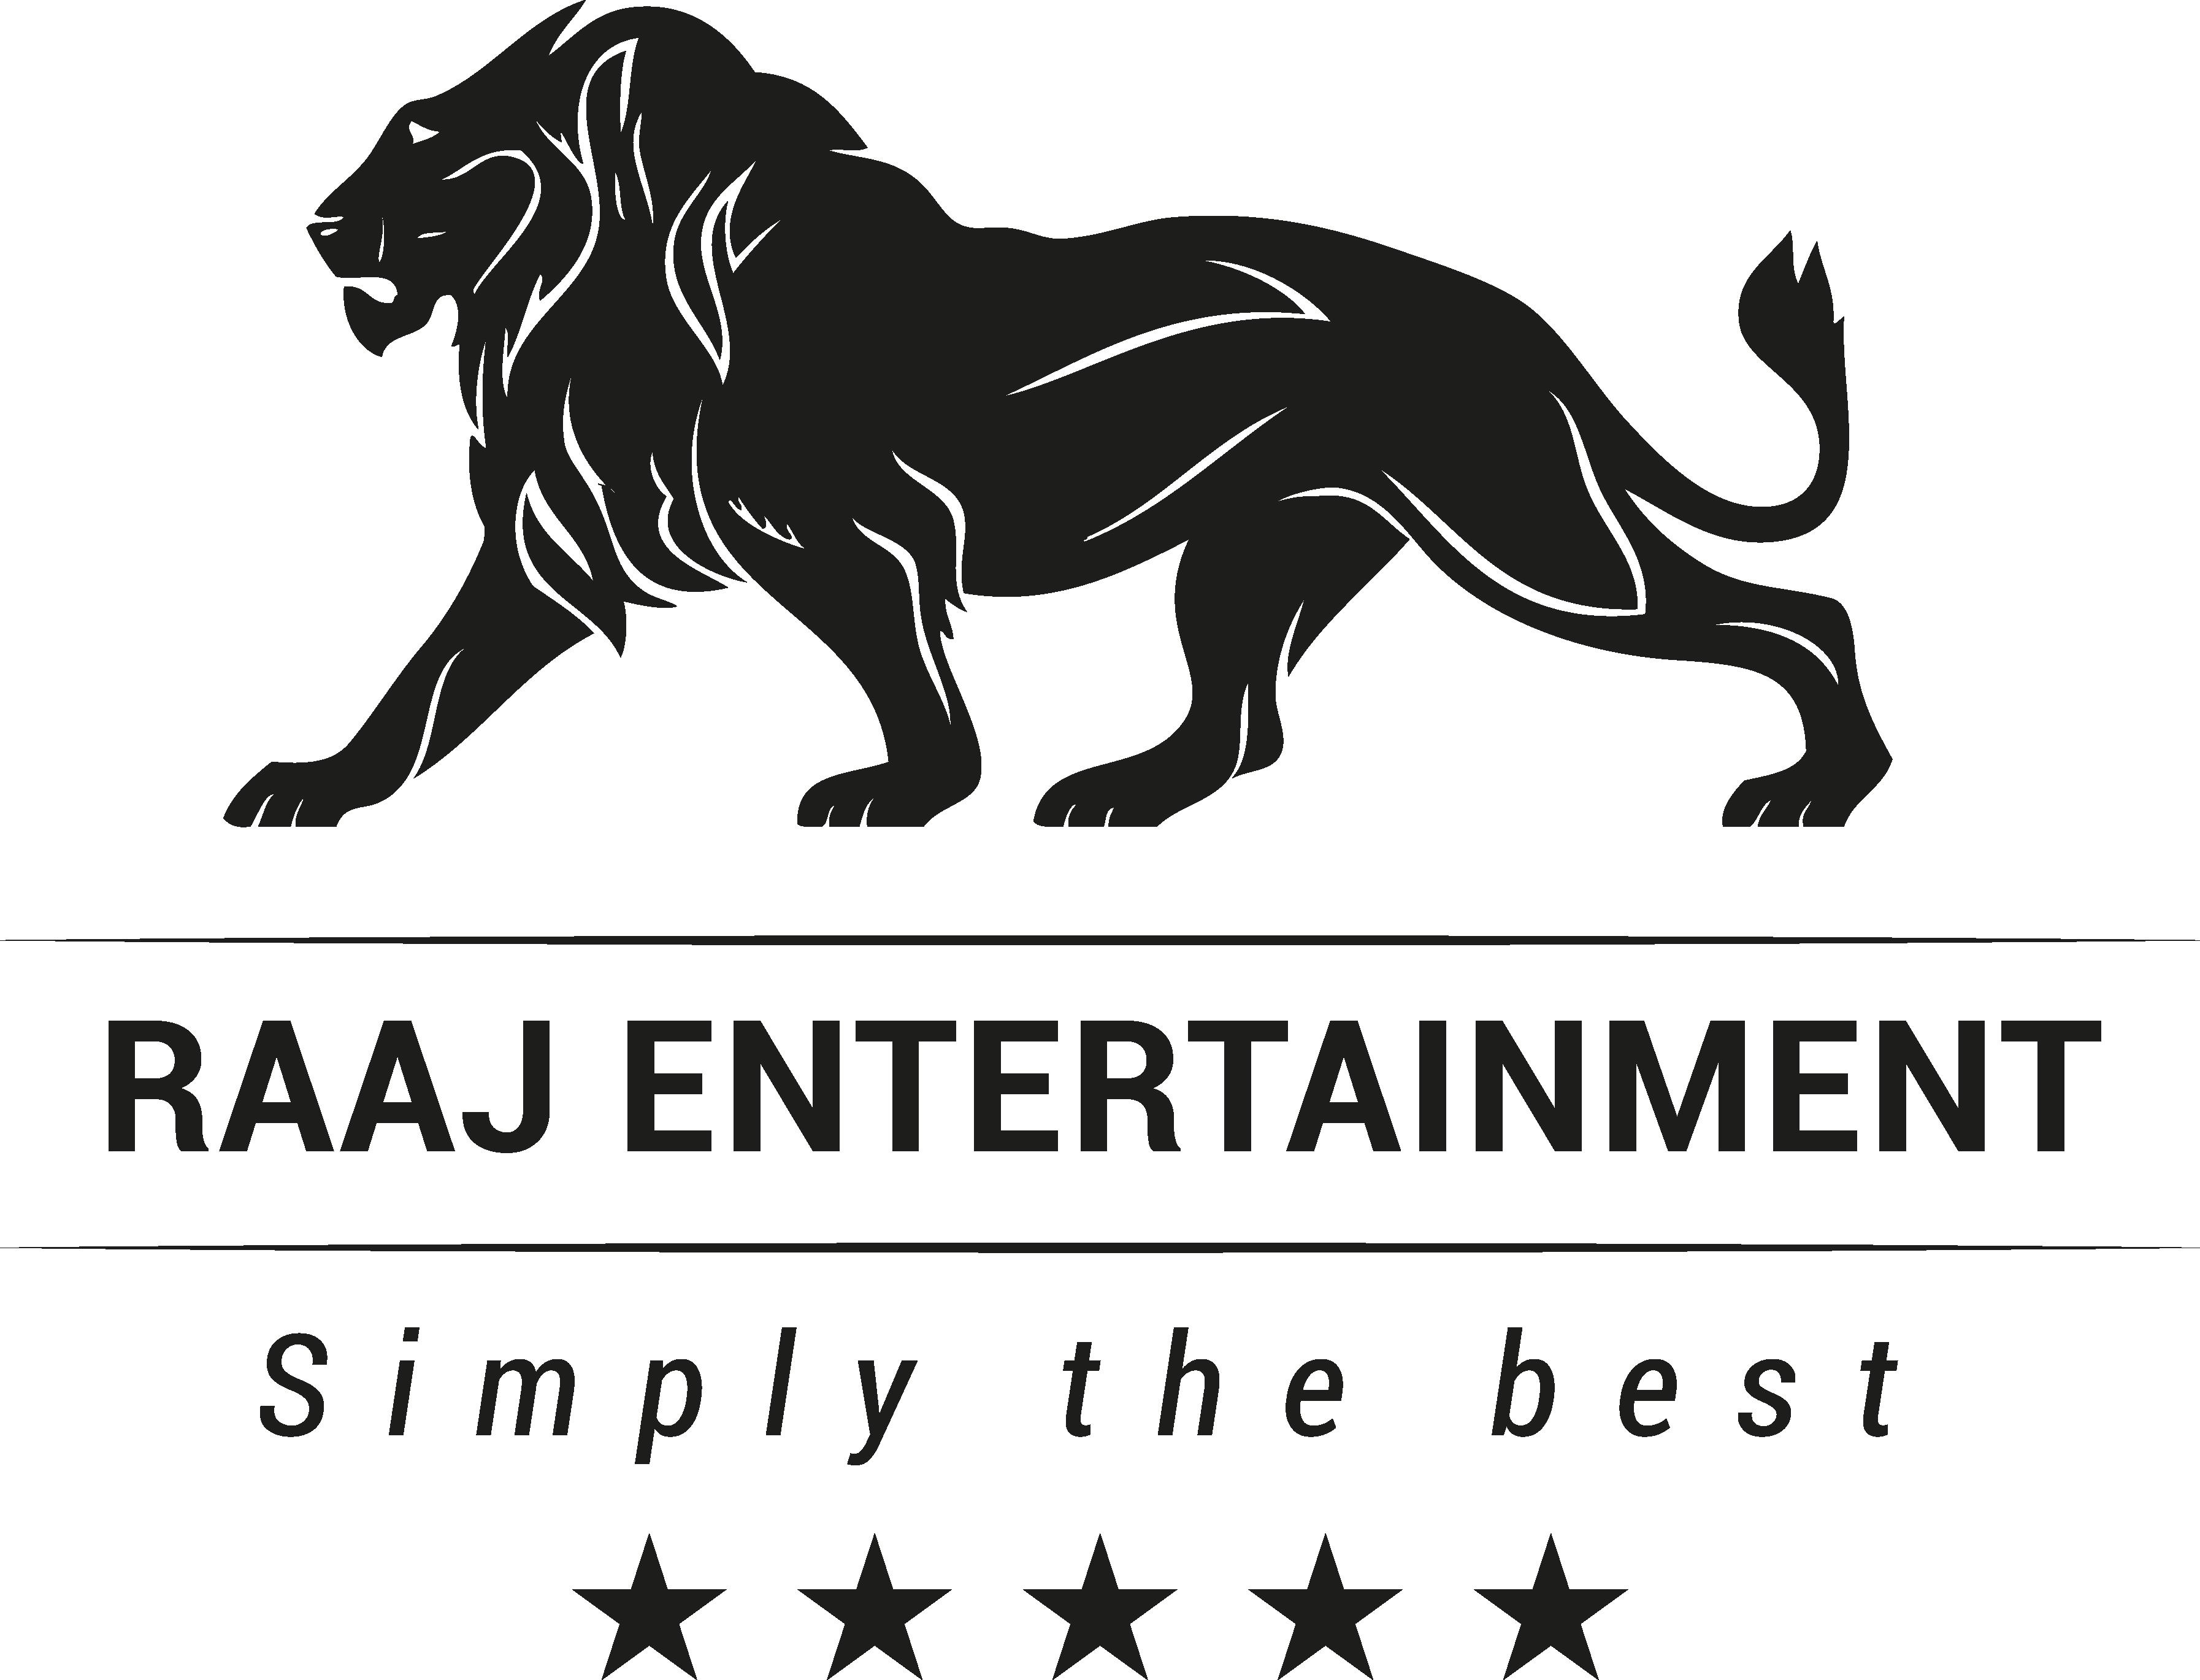 Raaj Entertainment